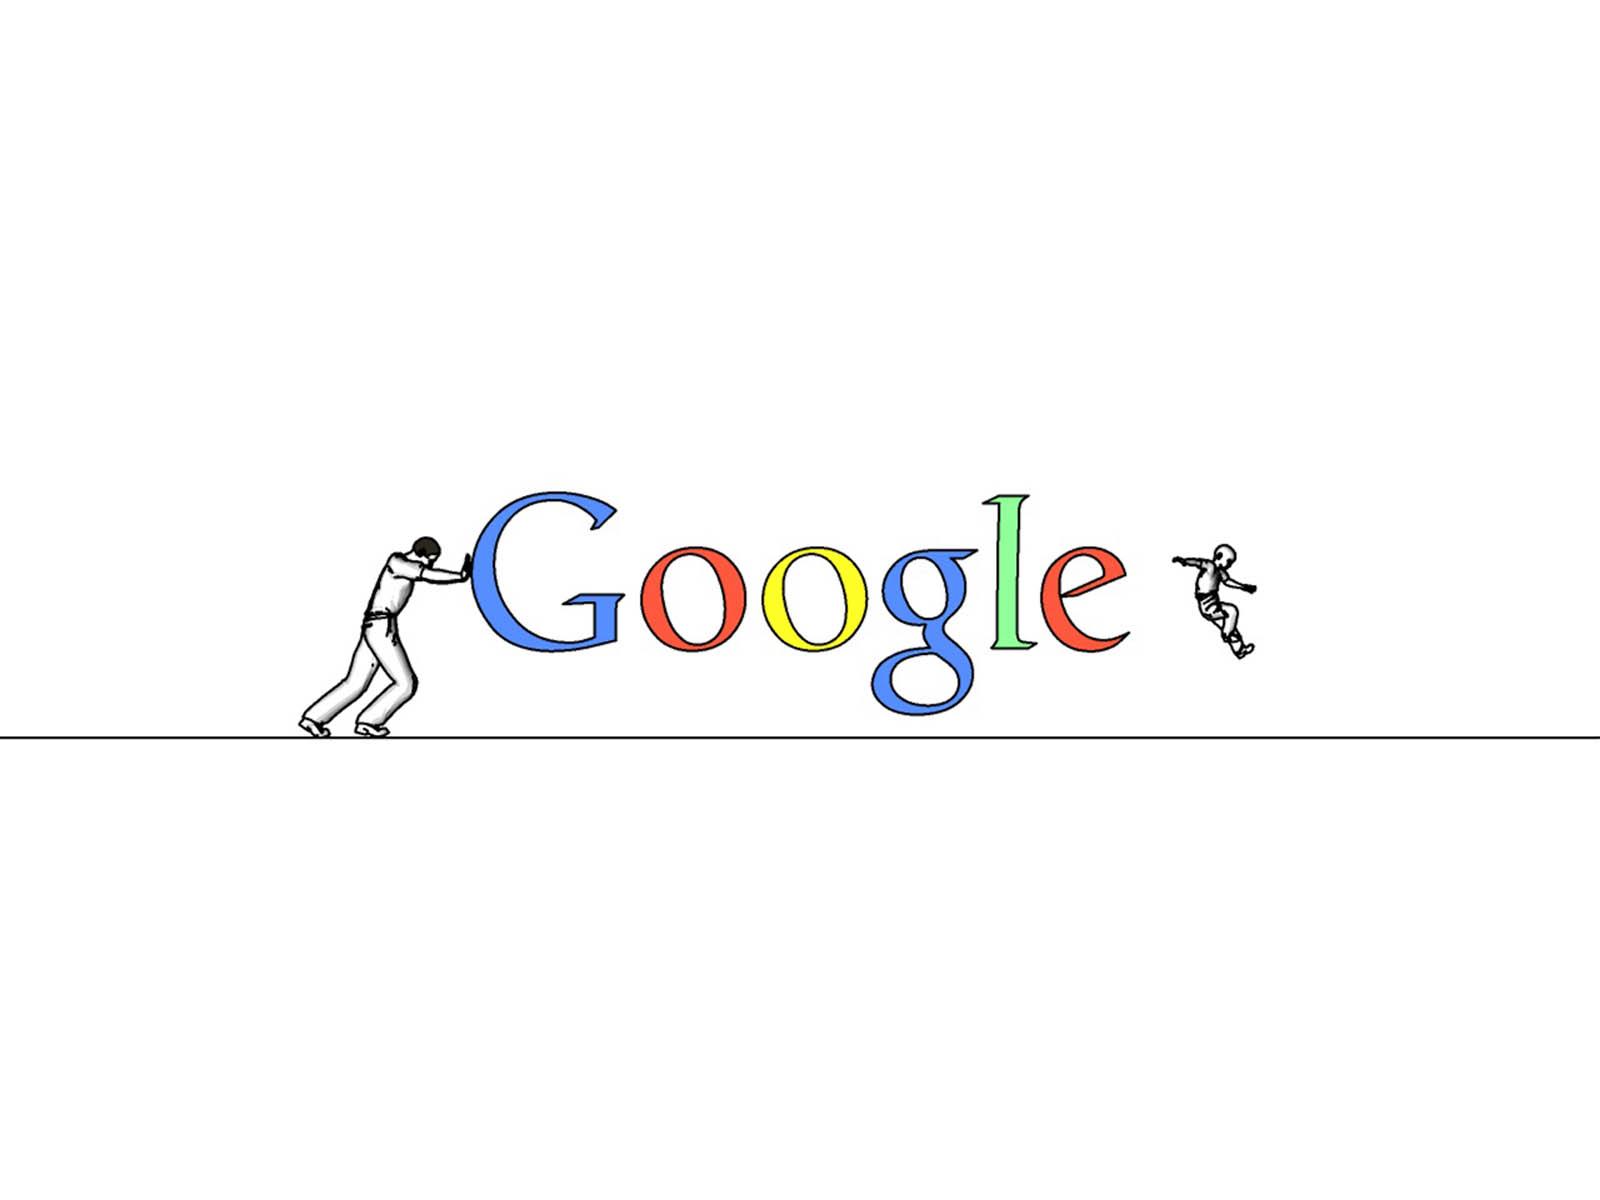 google desktop backgrounds vatoz atozdevelopment co